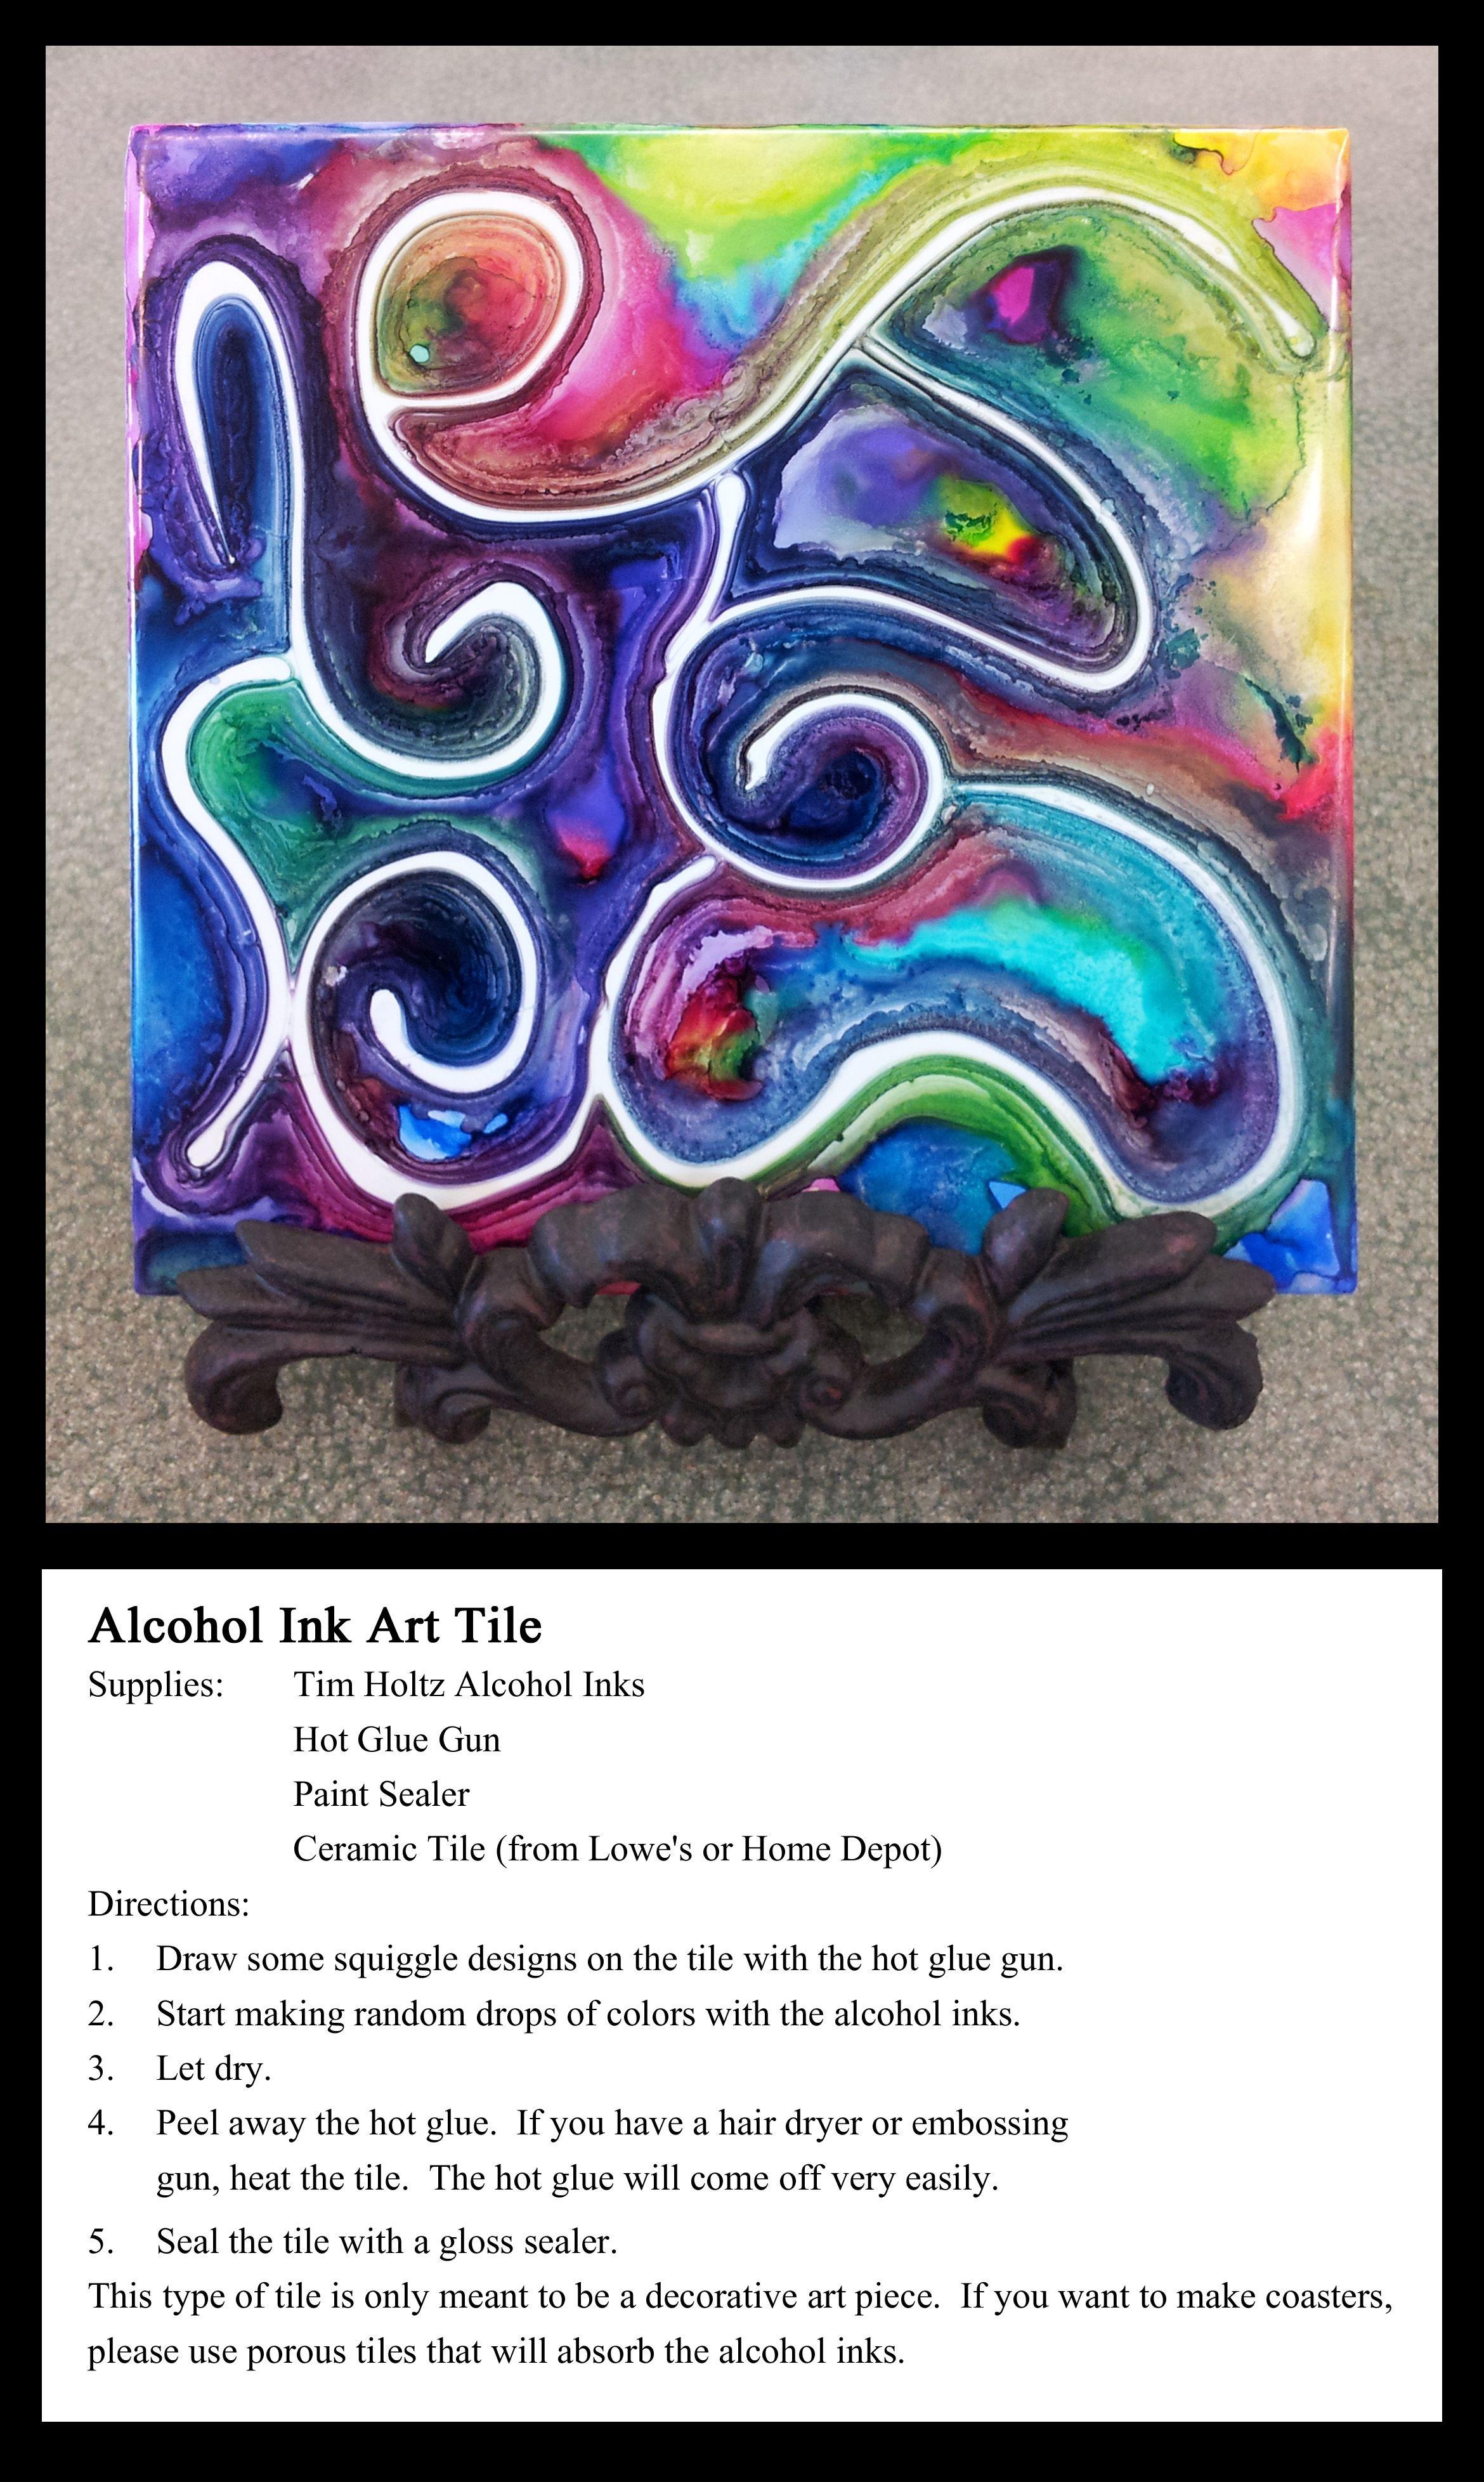 Alcohol ink art tile make a design on the tile using the hot glue alcohol ink art tile make a design on the tile using the hot glue gun dailygadgetfo Choice Image